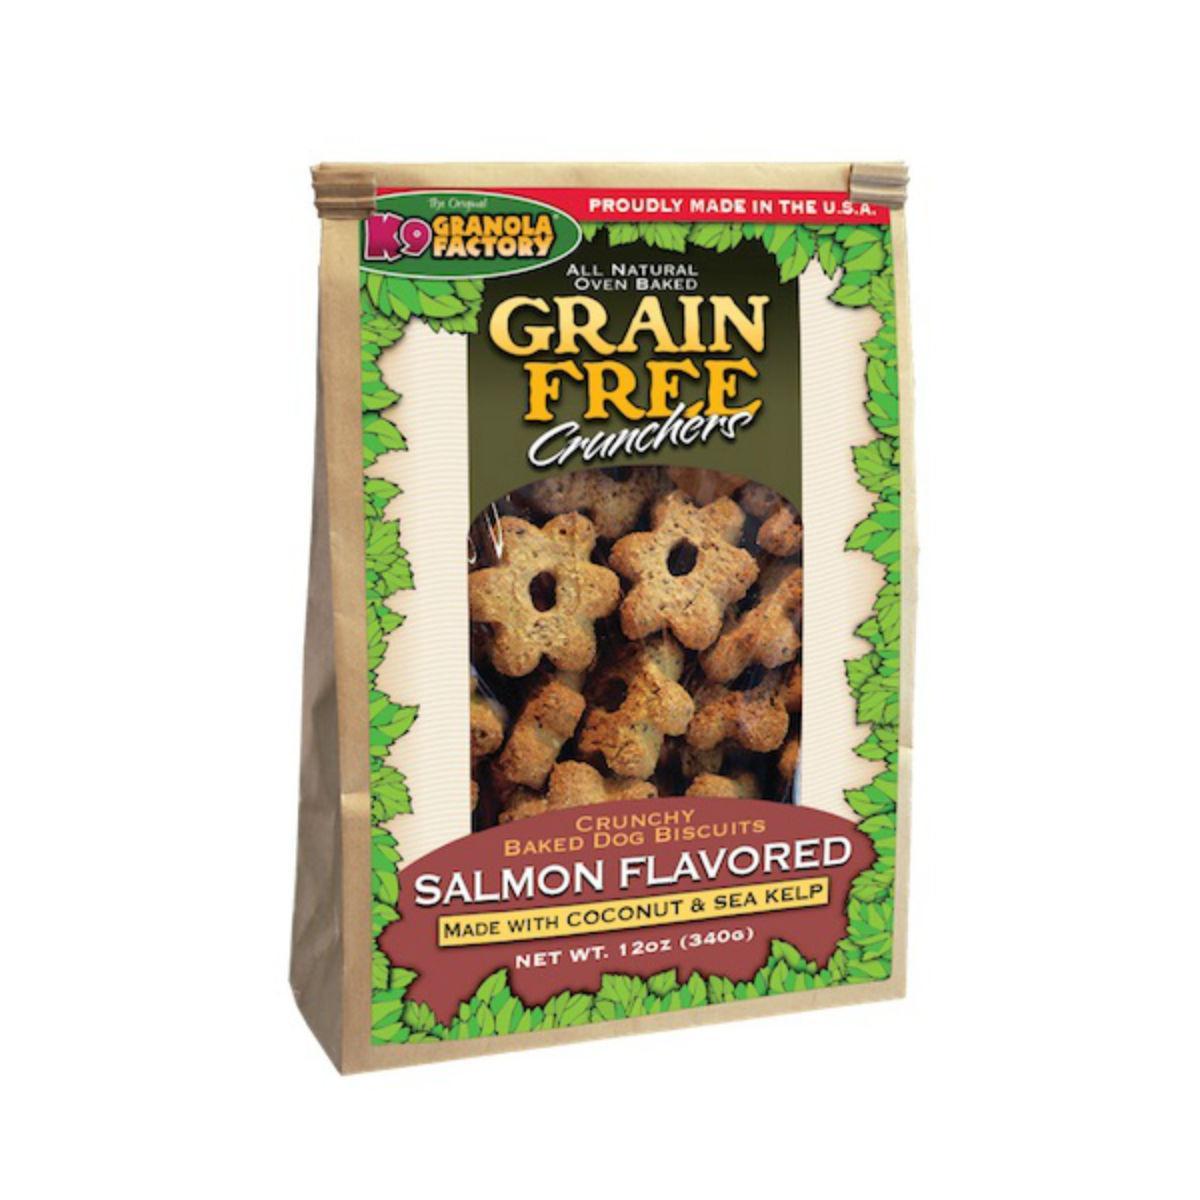 K9 Granola Factory Grain Free Crunchers Dog Treat - Atlantic Salmon with Coconut & Sea Kelp